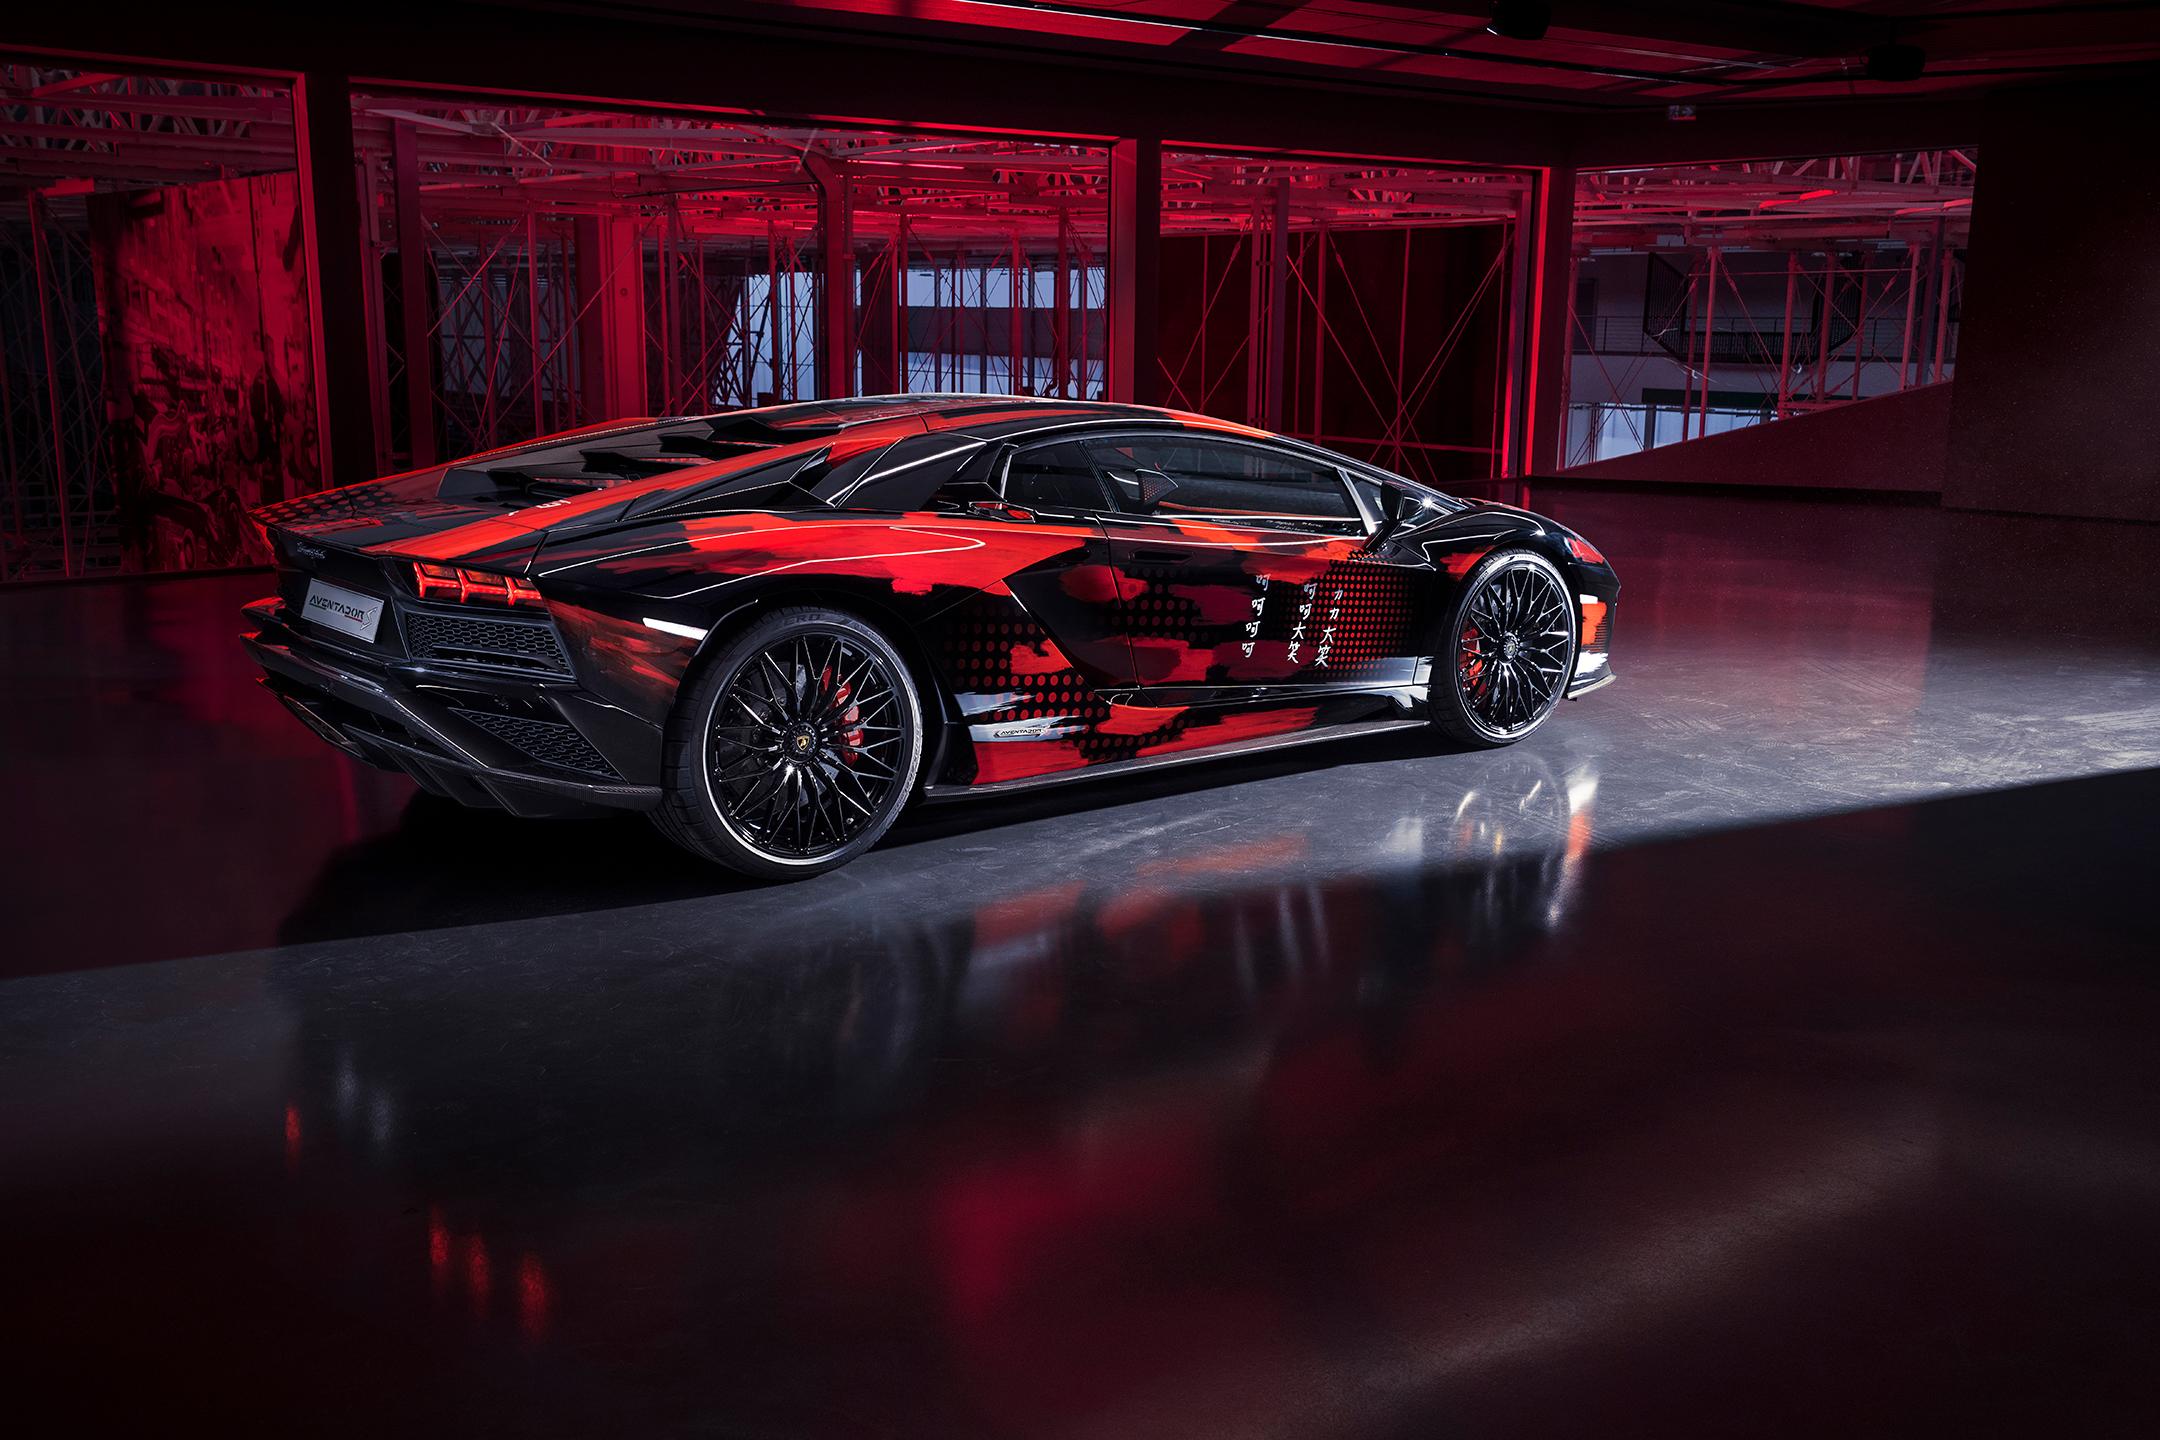 Lamborghini Aventador S x Yohji Yamamoto fashion designer - 2020 - rear side